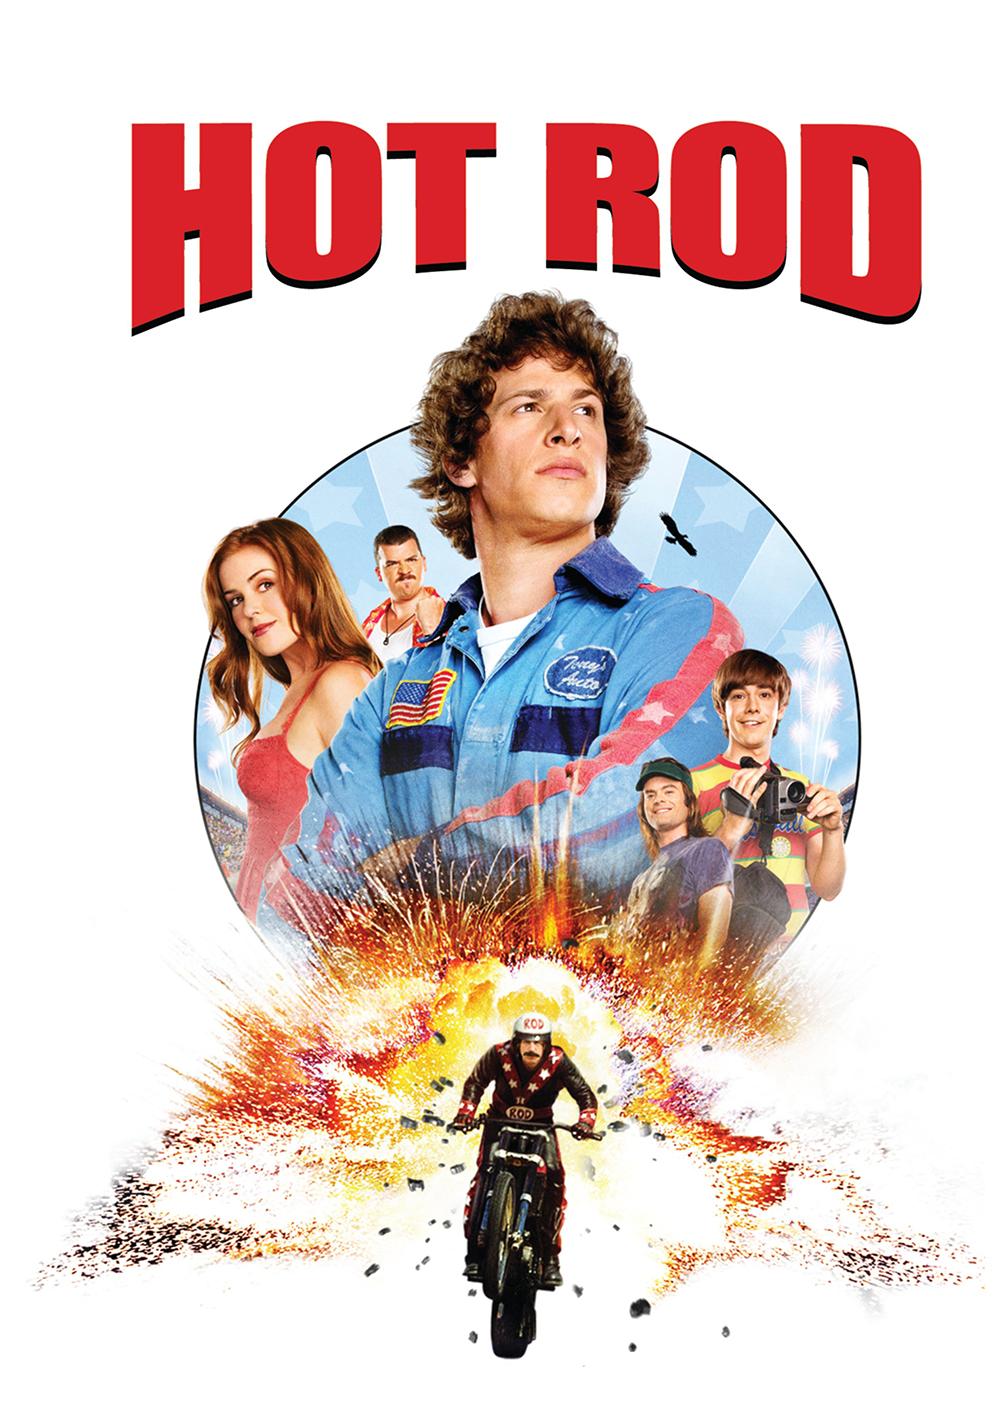 hot rod movie nude